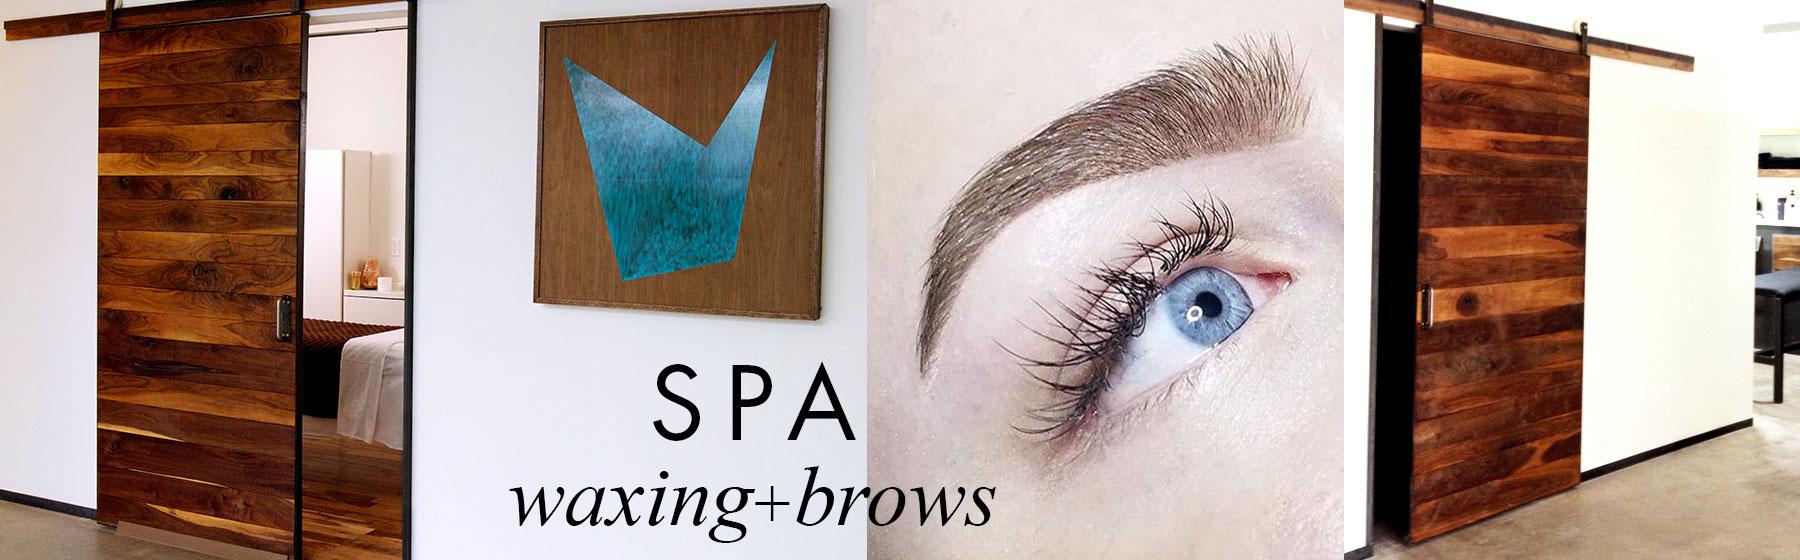 HAUS Salon waxing and brows spa